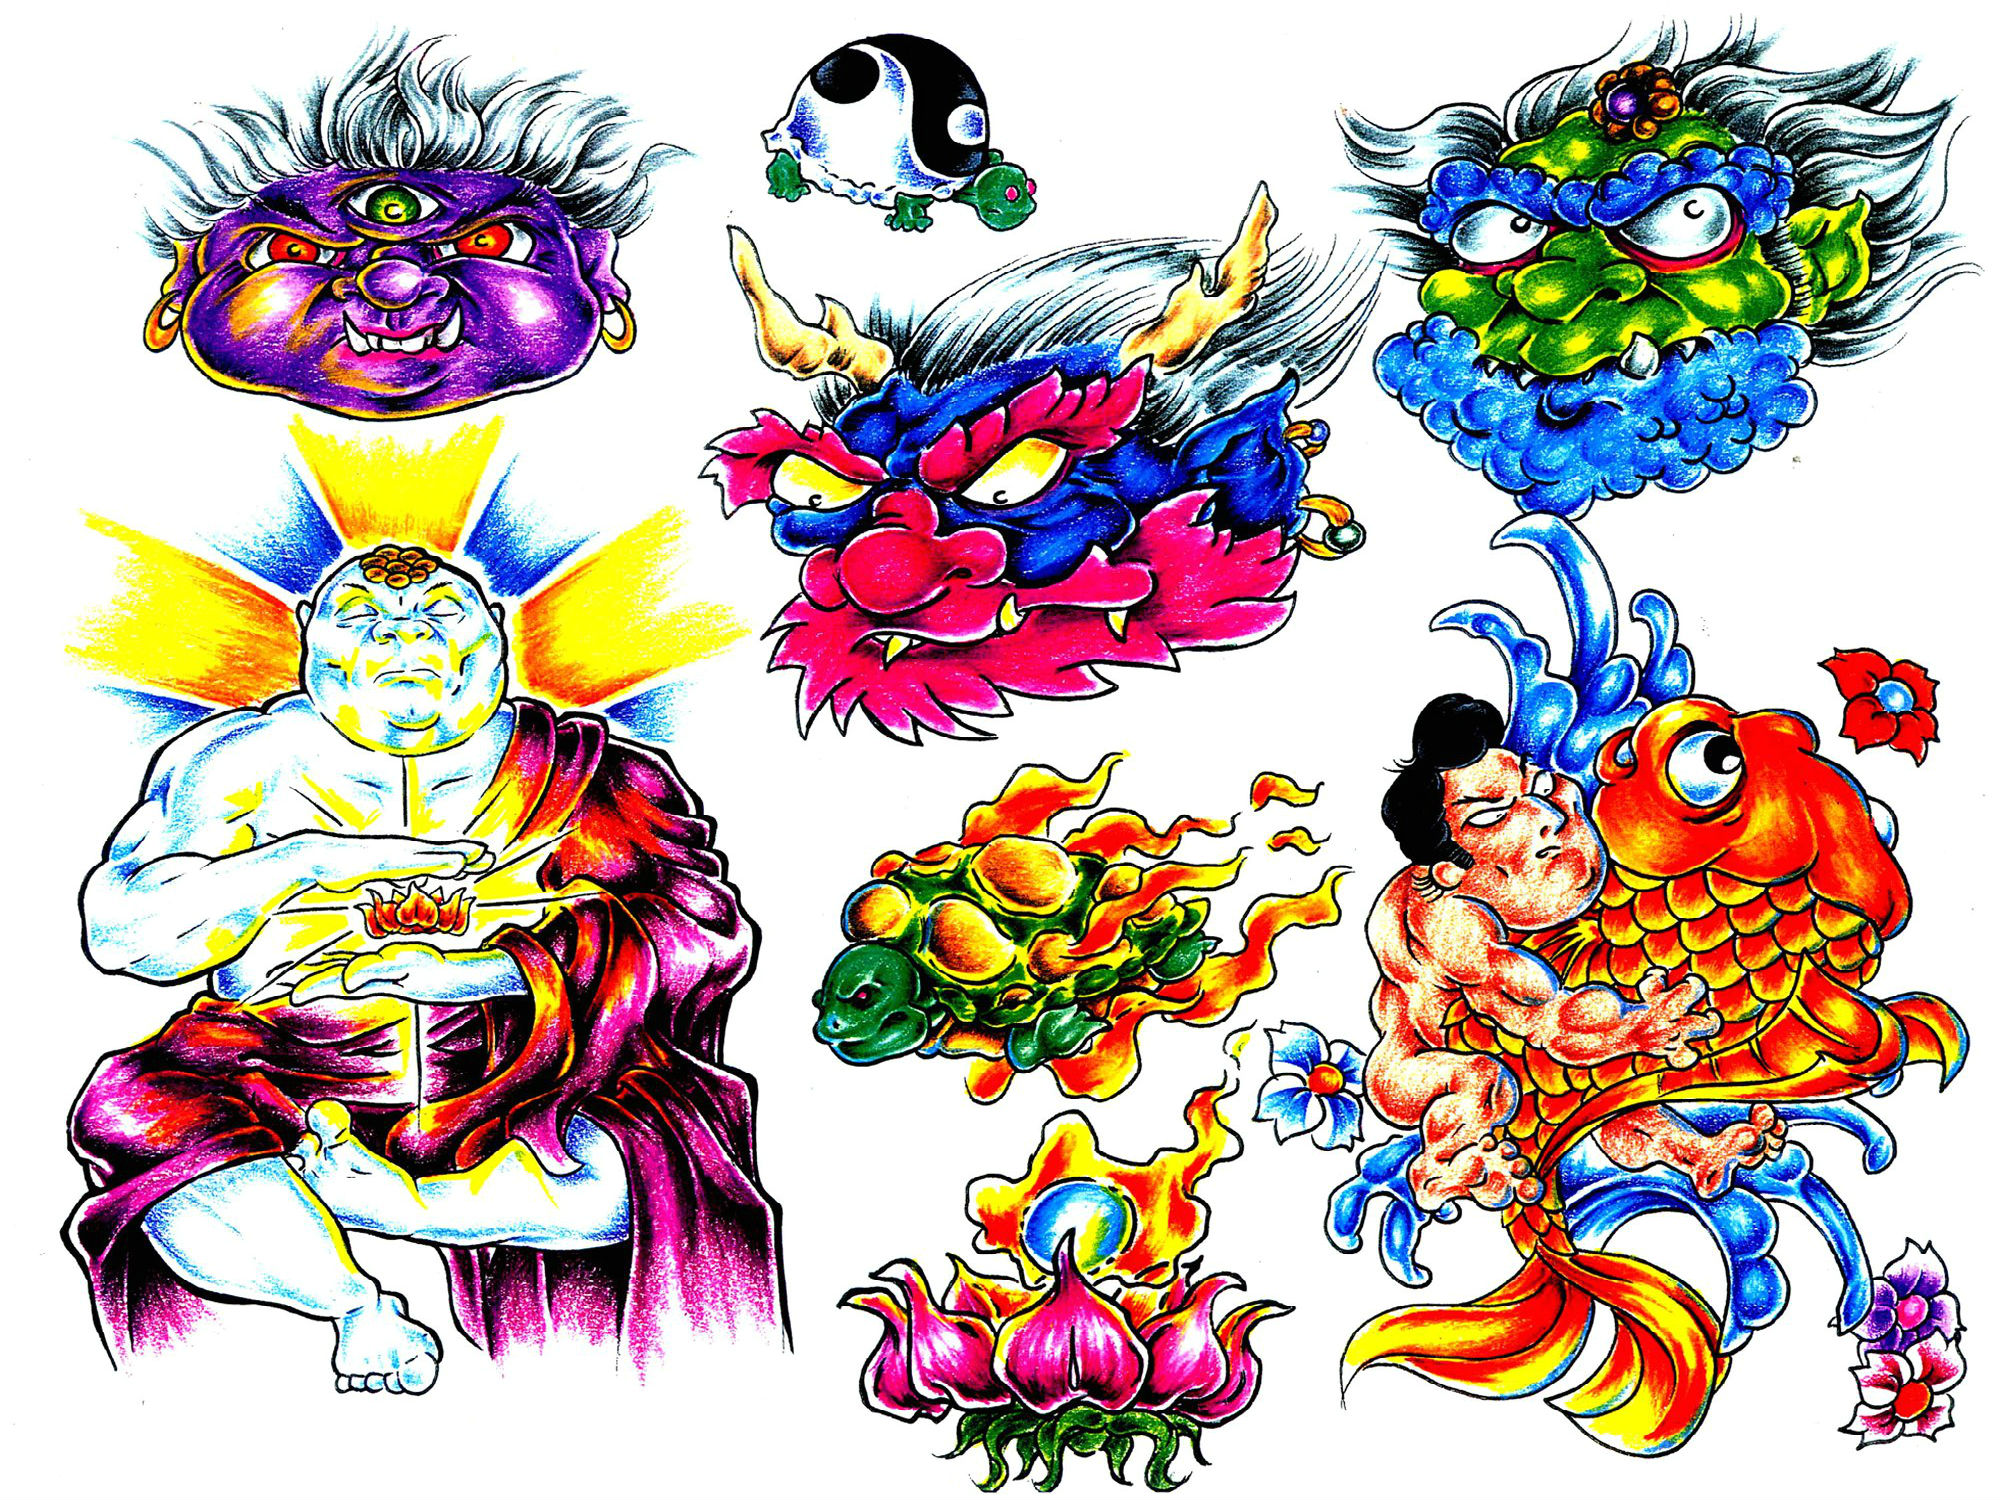 Triipy clipart desktop background Artistic Backgrounds Tattoo Artistic 2000x1500